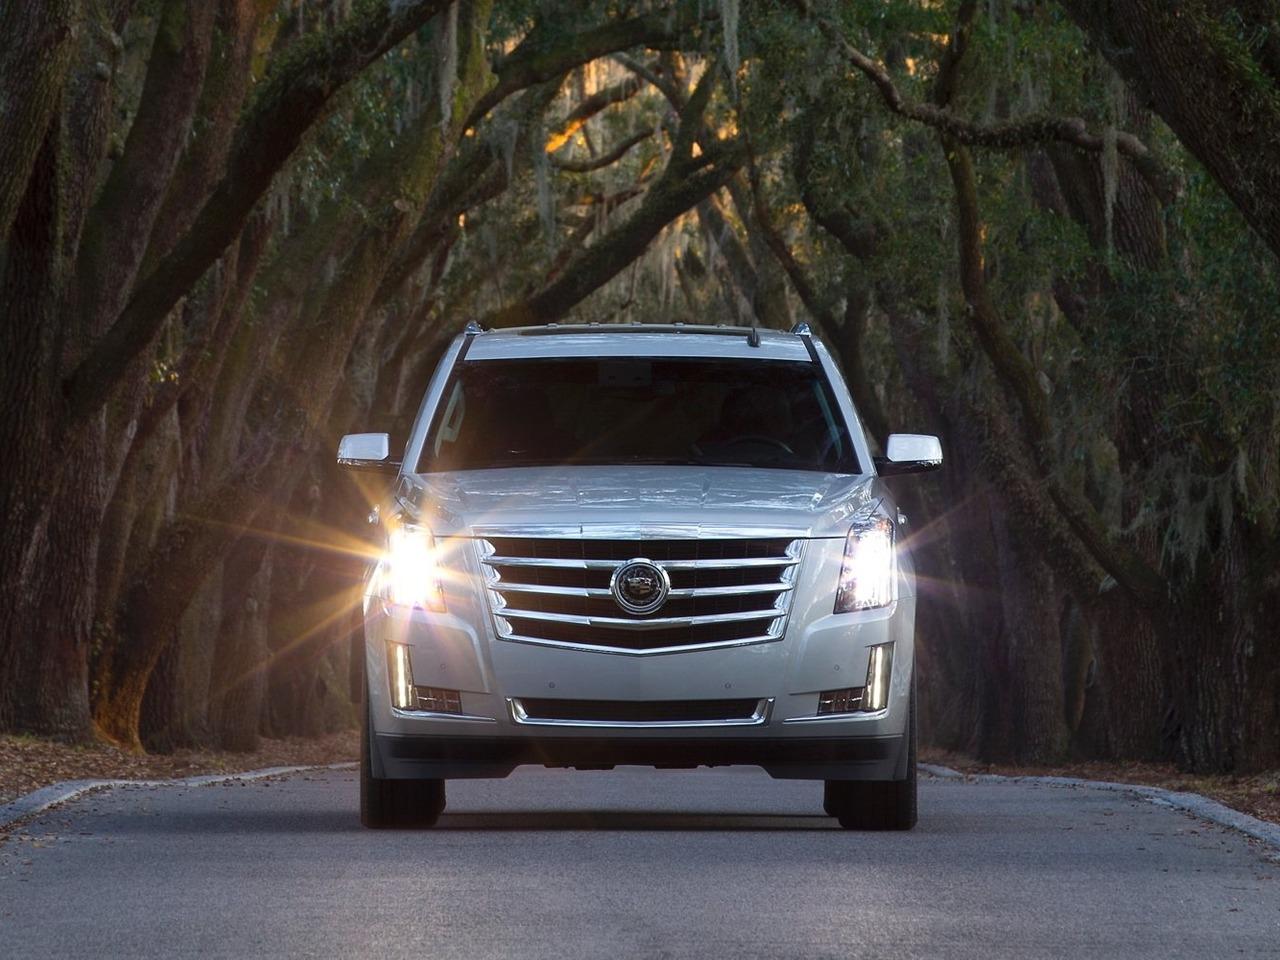 Снимки: Cadillac Escalade IV